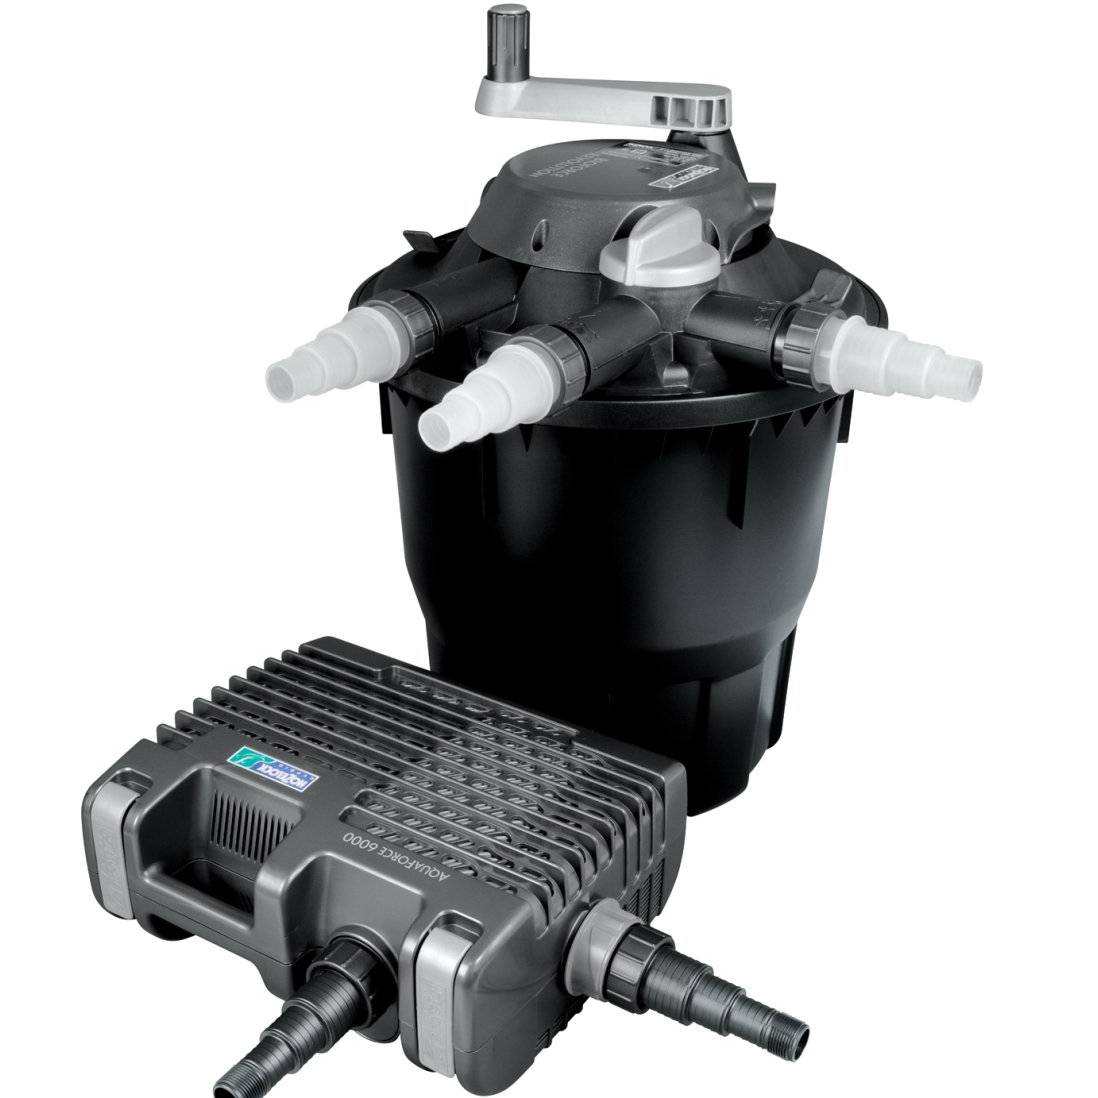 Hozelock Bioforce Revolution 6000 + Aquaforce Kit (1402)